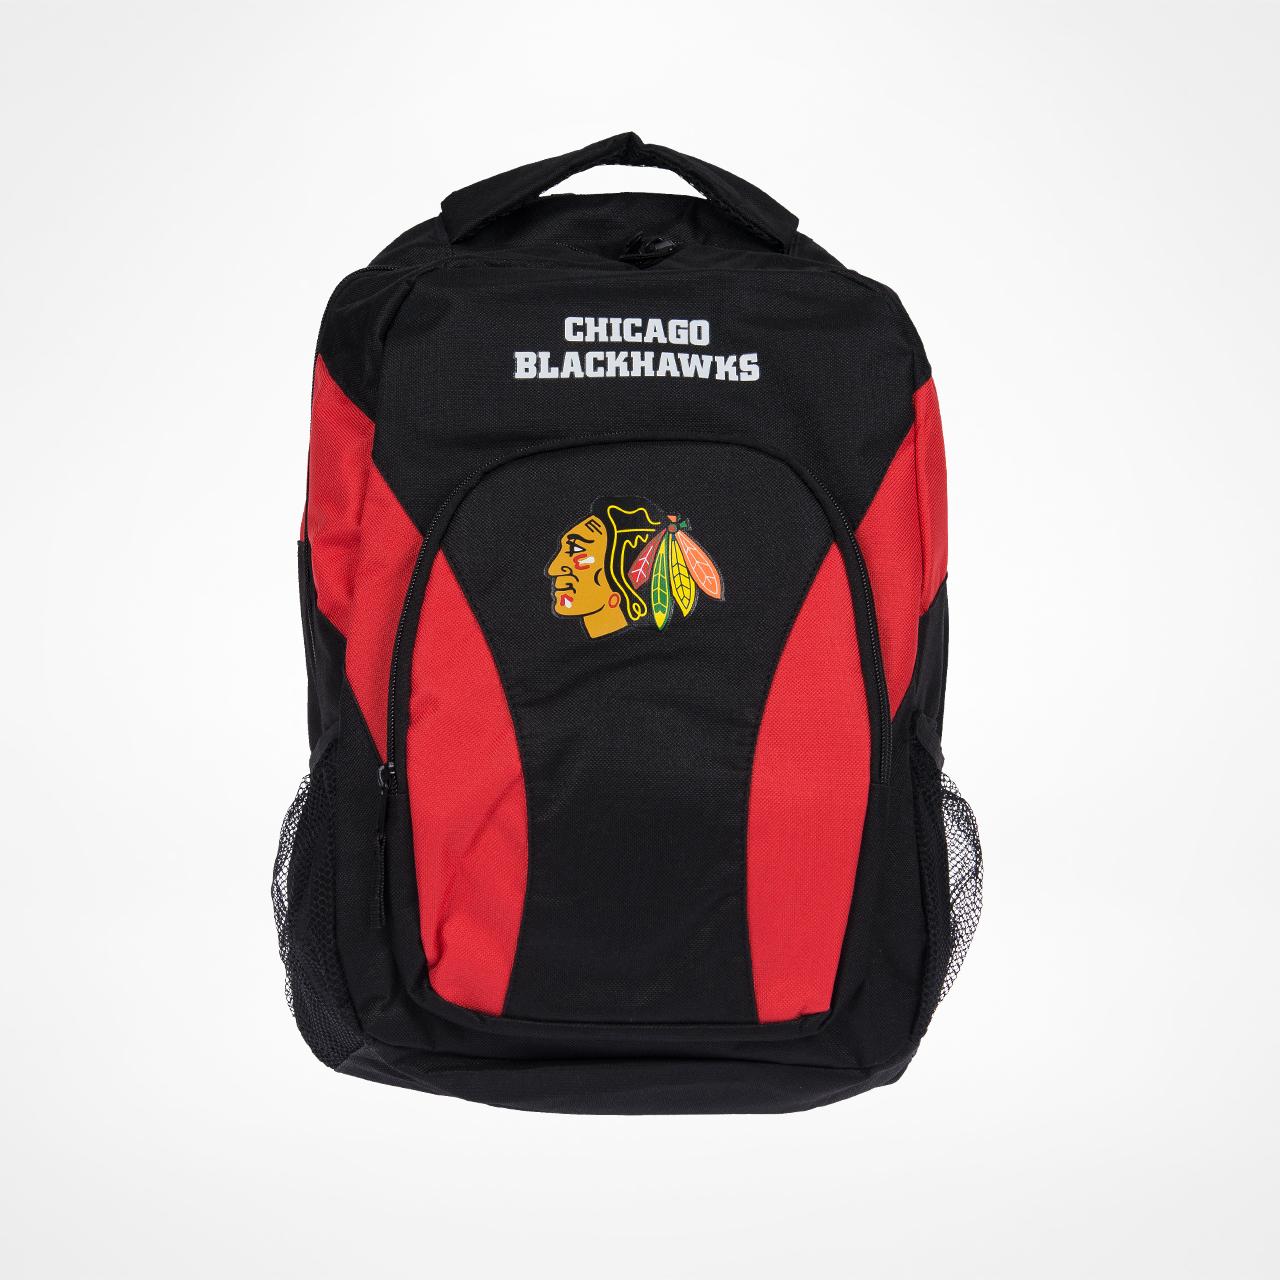 Boston Bruins Ryggsäck Draft Day SupportersPlace